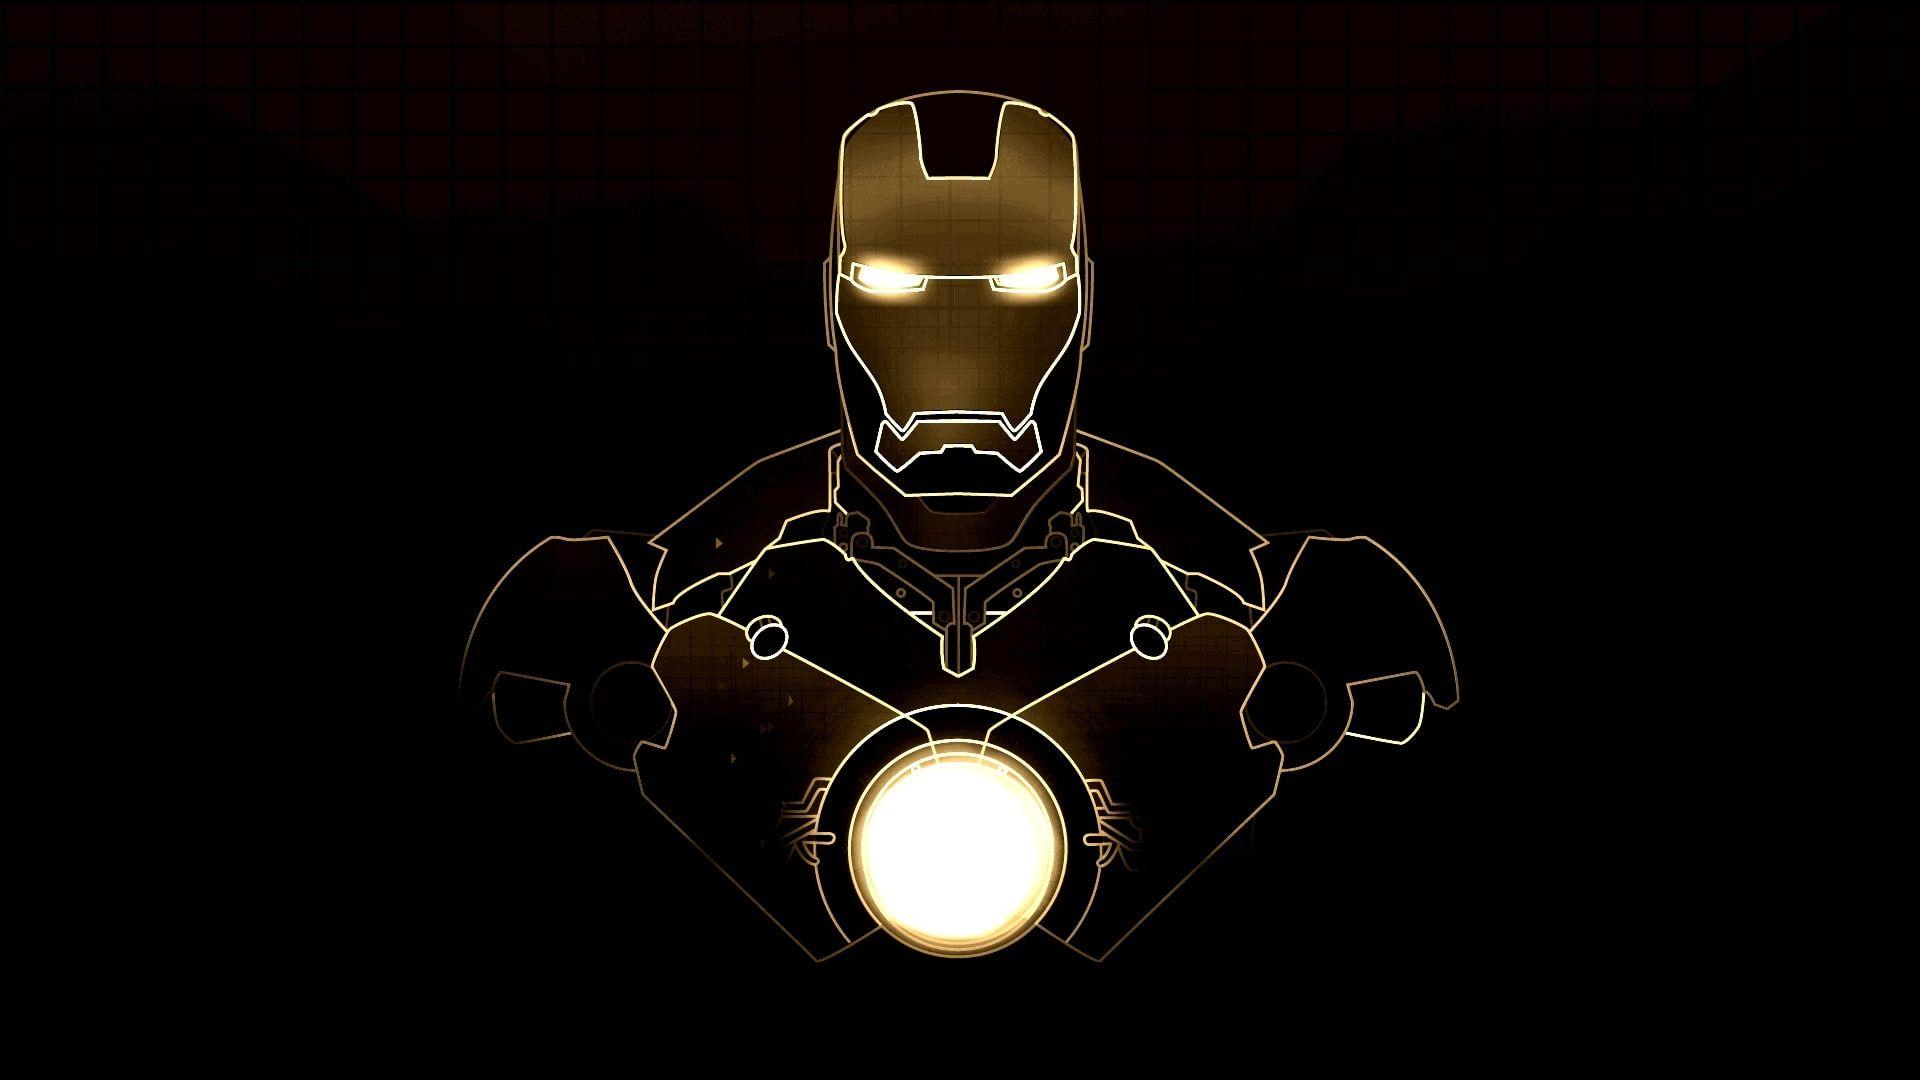 Iron Man Black Hd Cartoon Comic Black Man Iron 1080p Wallpaper Hdwallpaper Desktop Iron Man Wallpaper Iron Man Hd Wallpaper Man Wallpaper